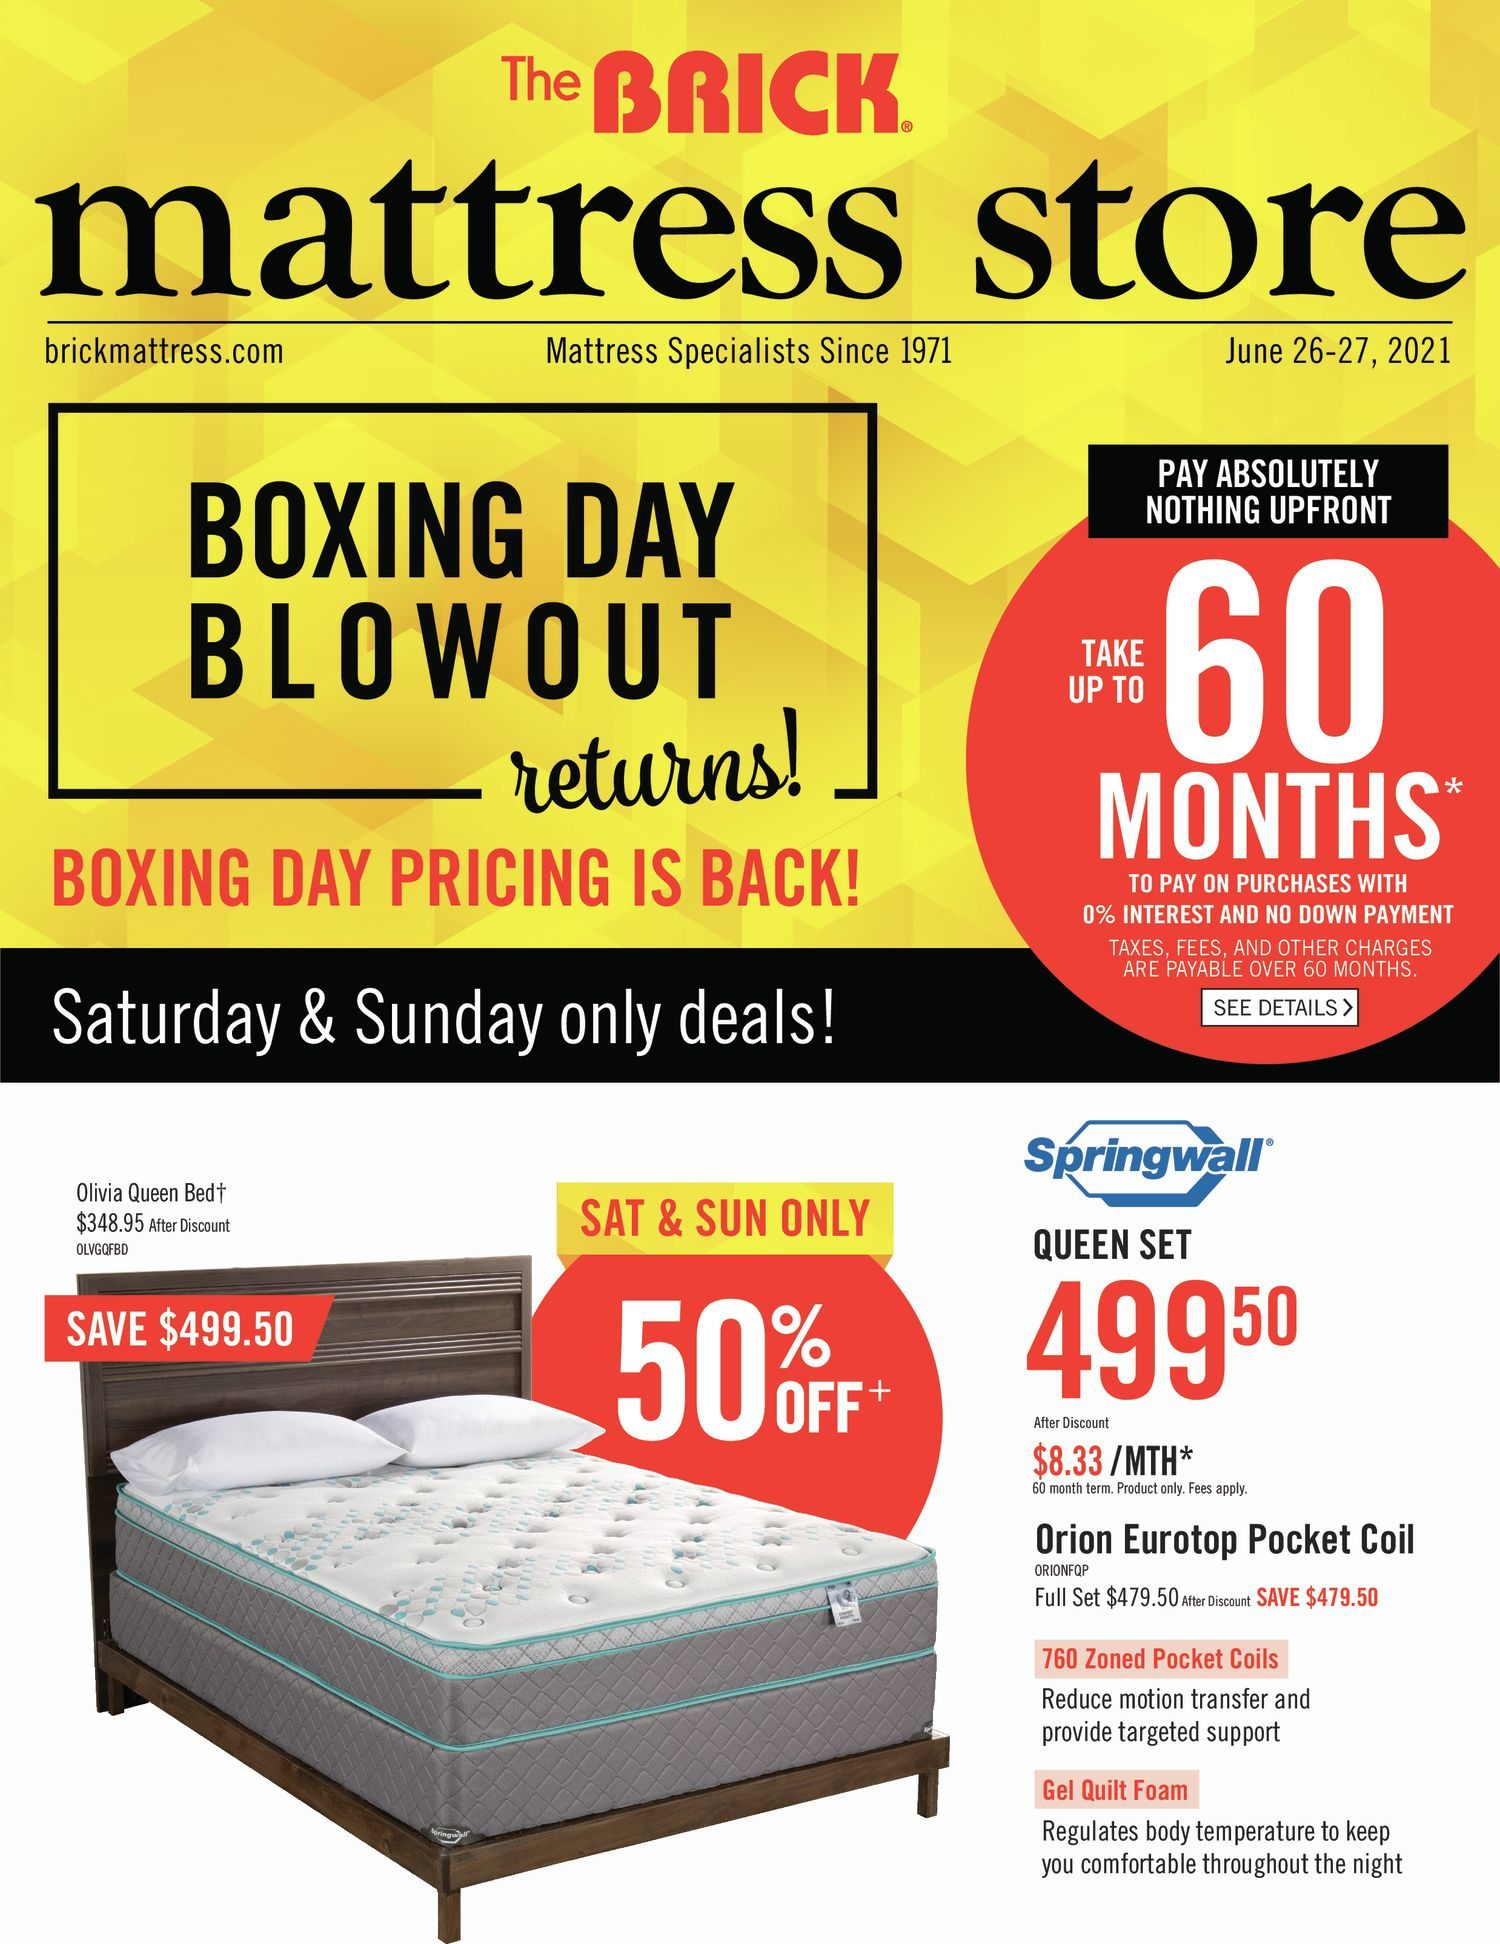 The Brick - Mattress Store - Boxing Week Blowout Returns